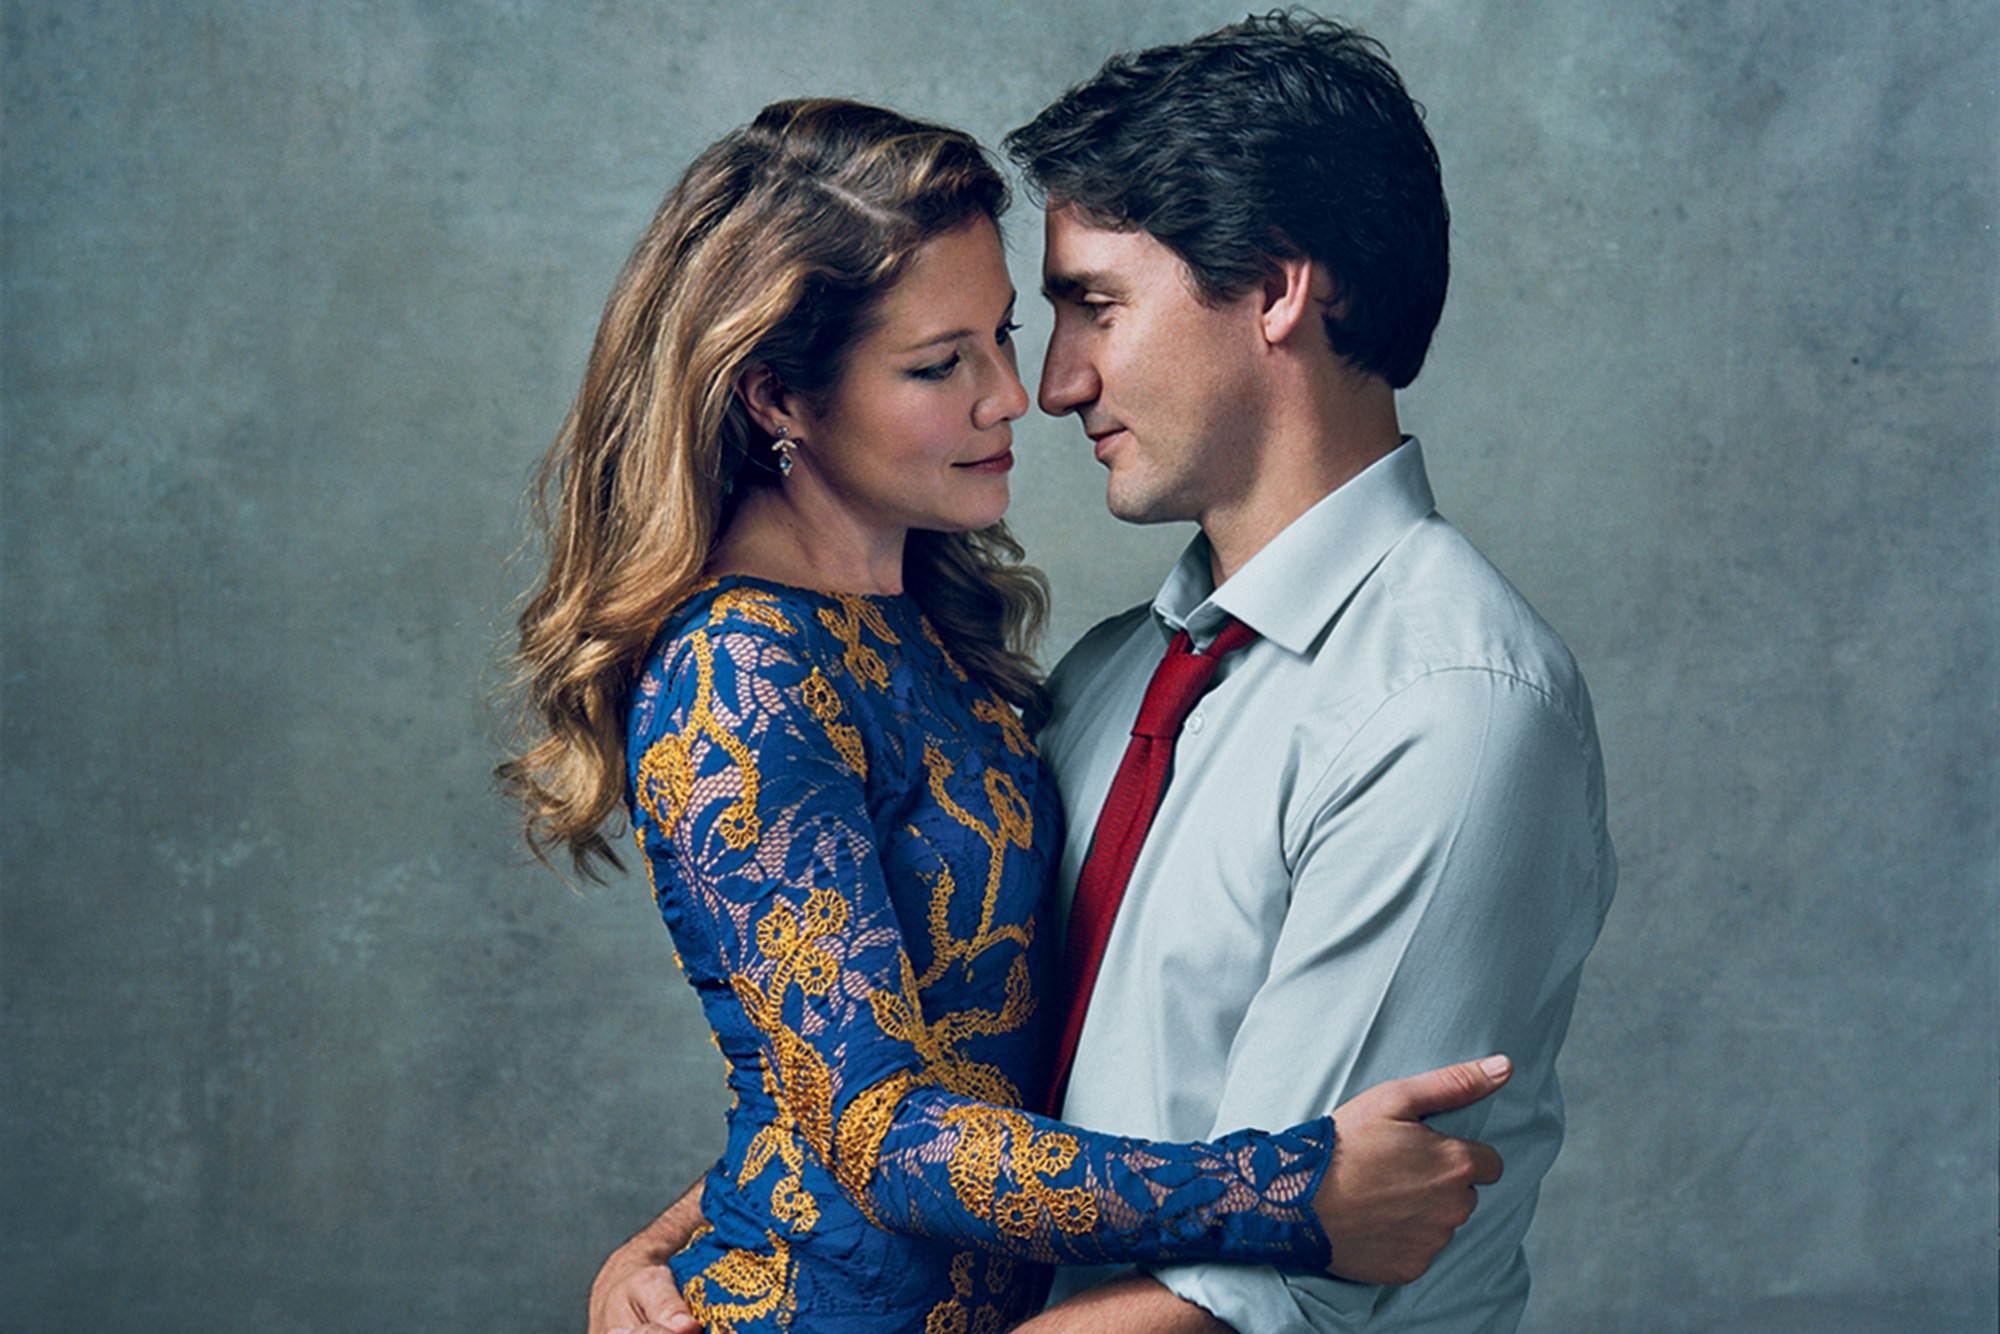 Софи Грегуар: первая леди Канады, красавица и просто добрая душа